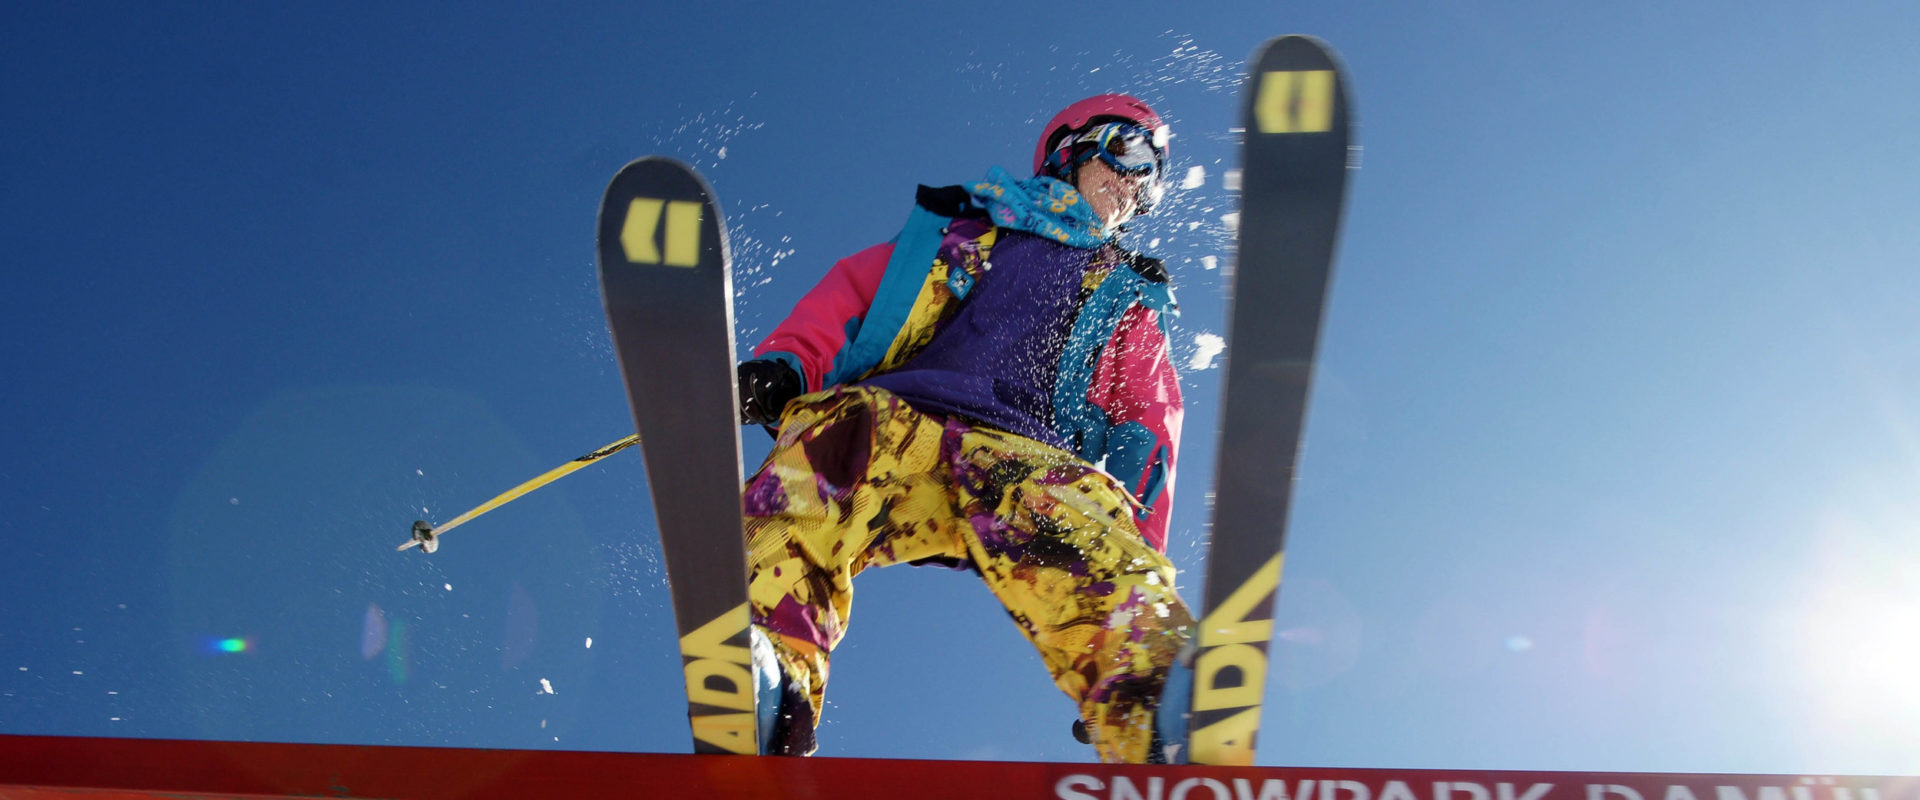 Skigebiet Damüls-Mellau © Ludwig Berchtold / Bergbahnen Mellau